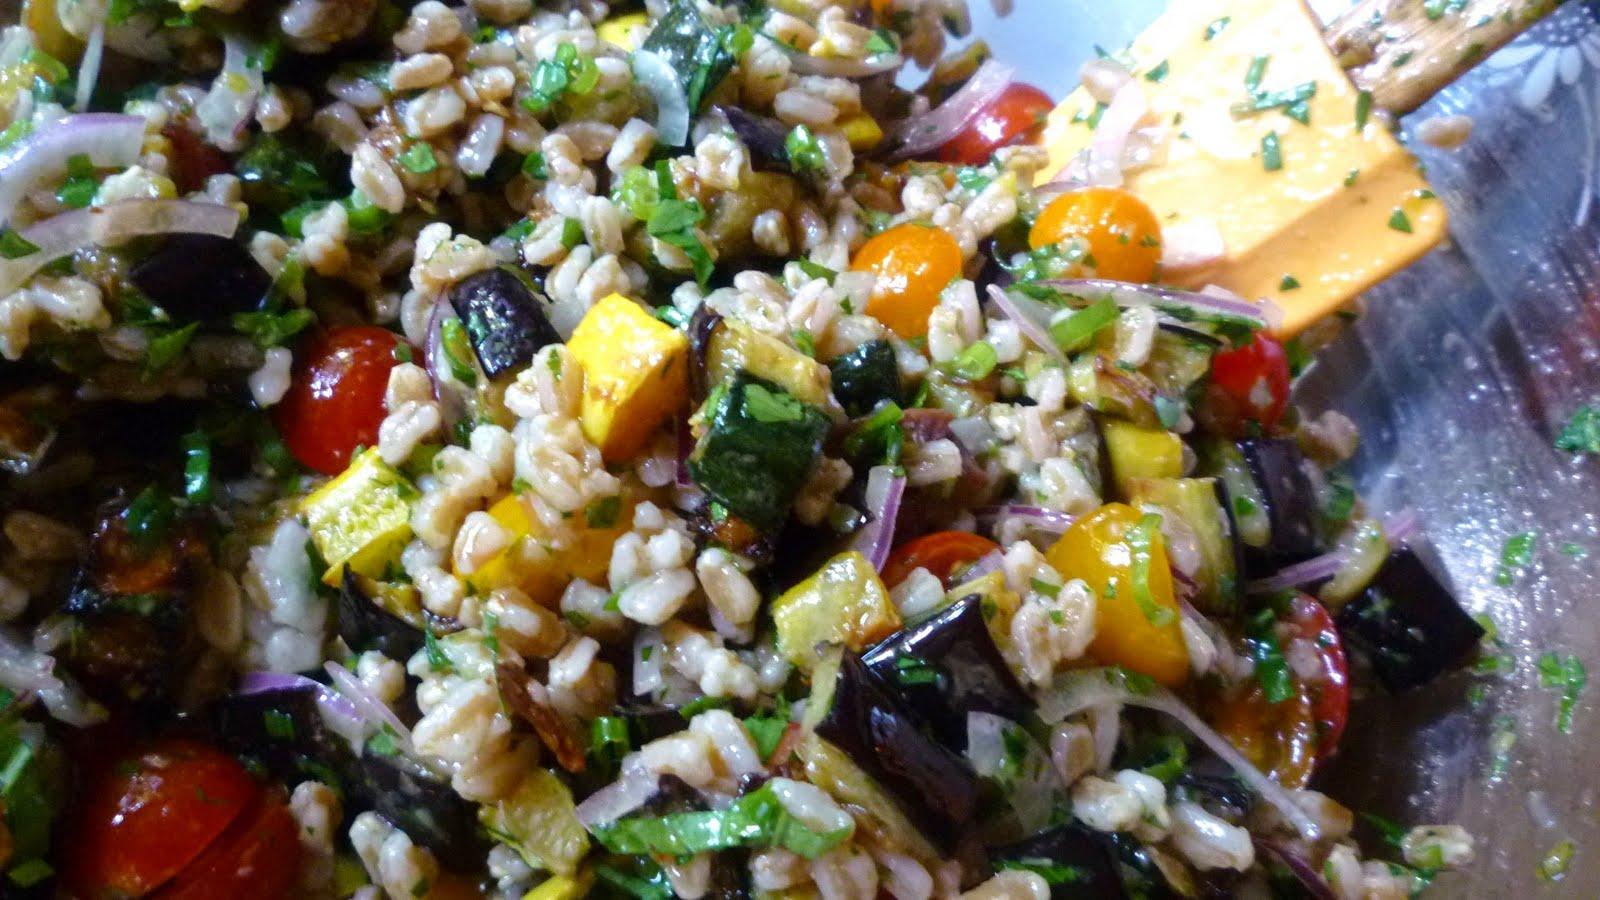 and barley salad recipe yummly mediterranean eggplant and barley salad ...